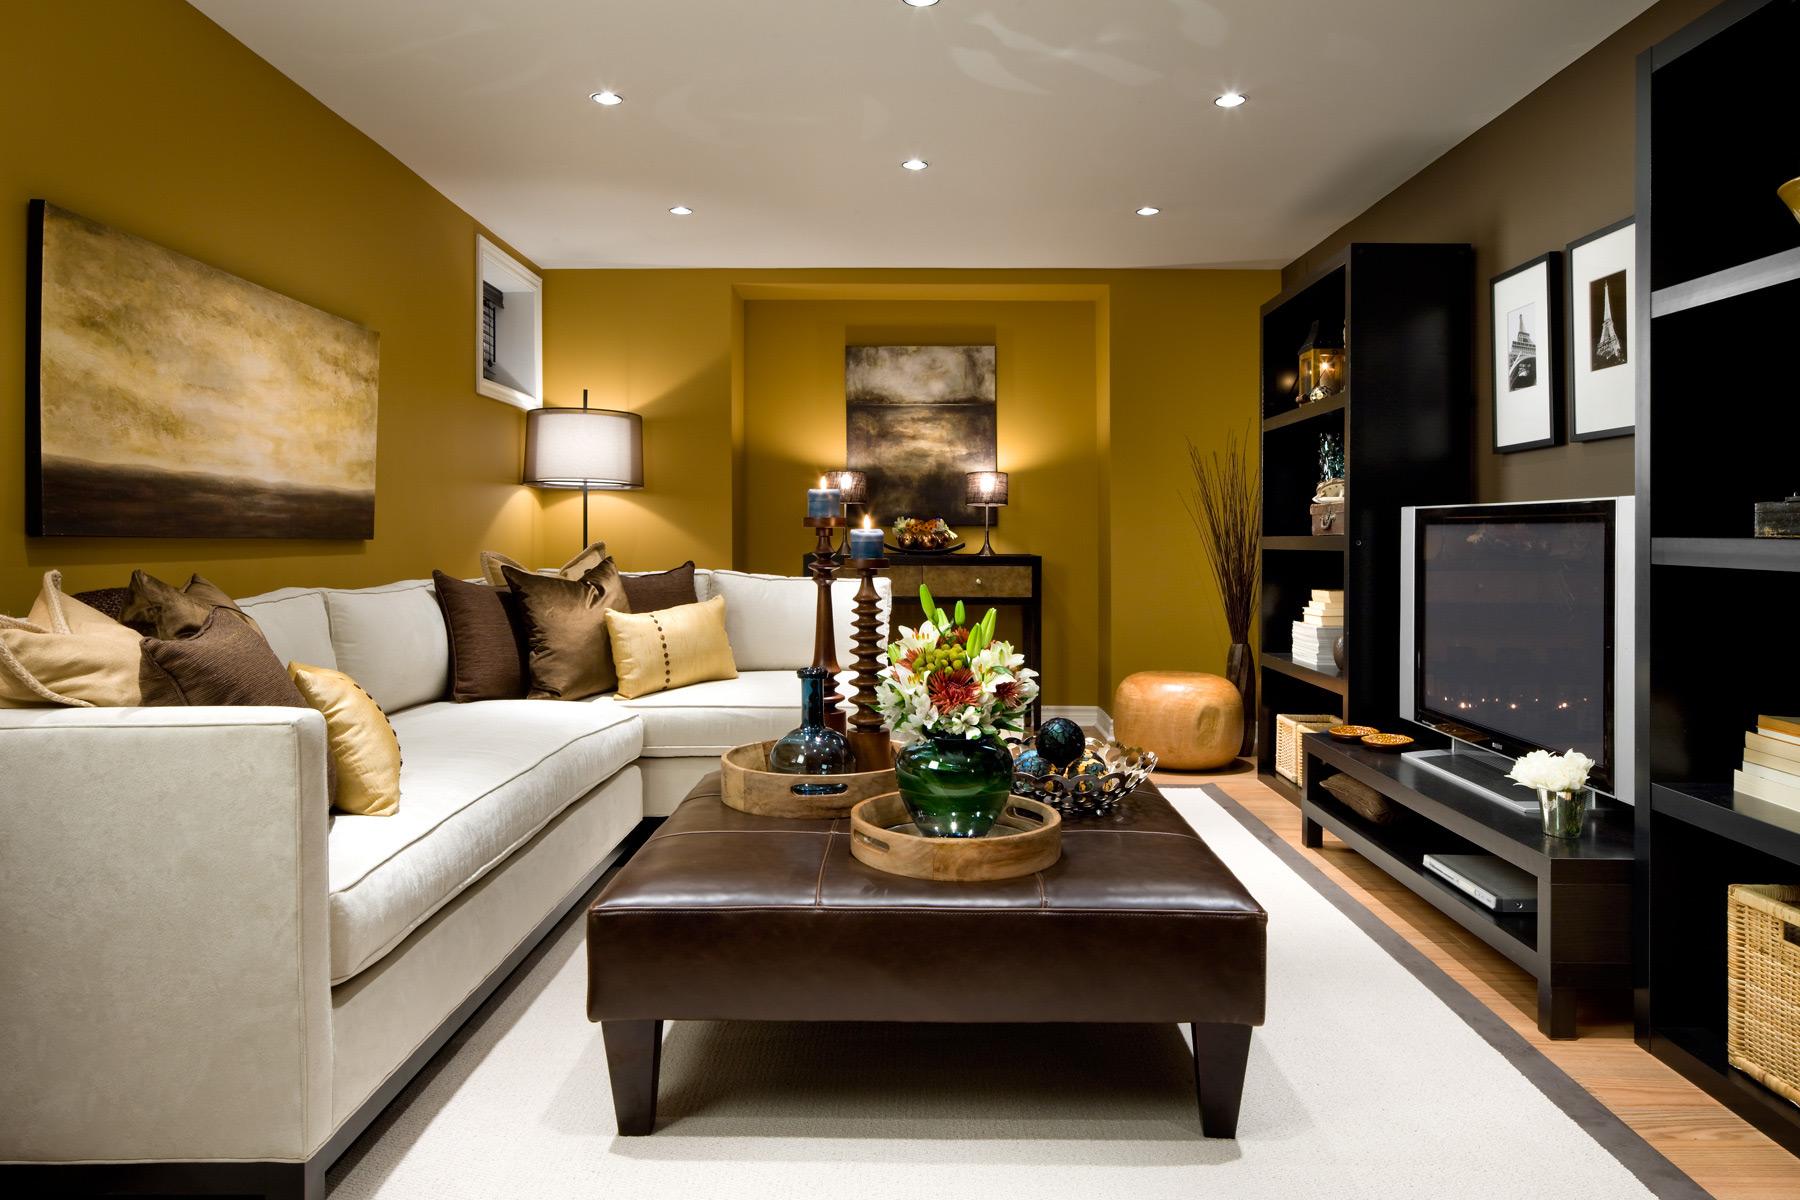 Living room design 2. Earthly pleasures HUCPFUT